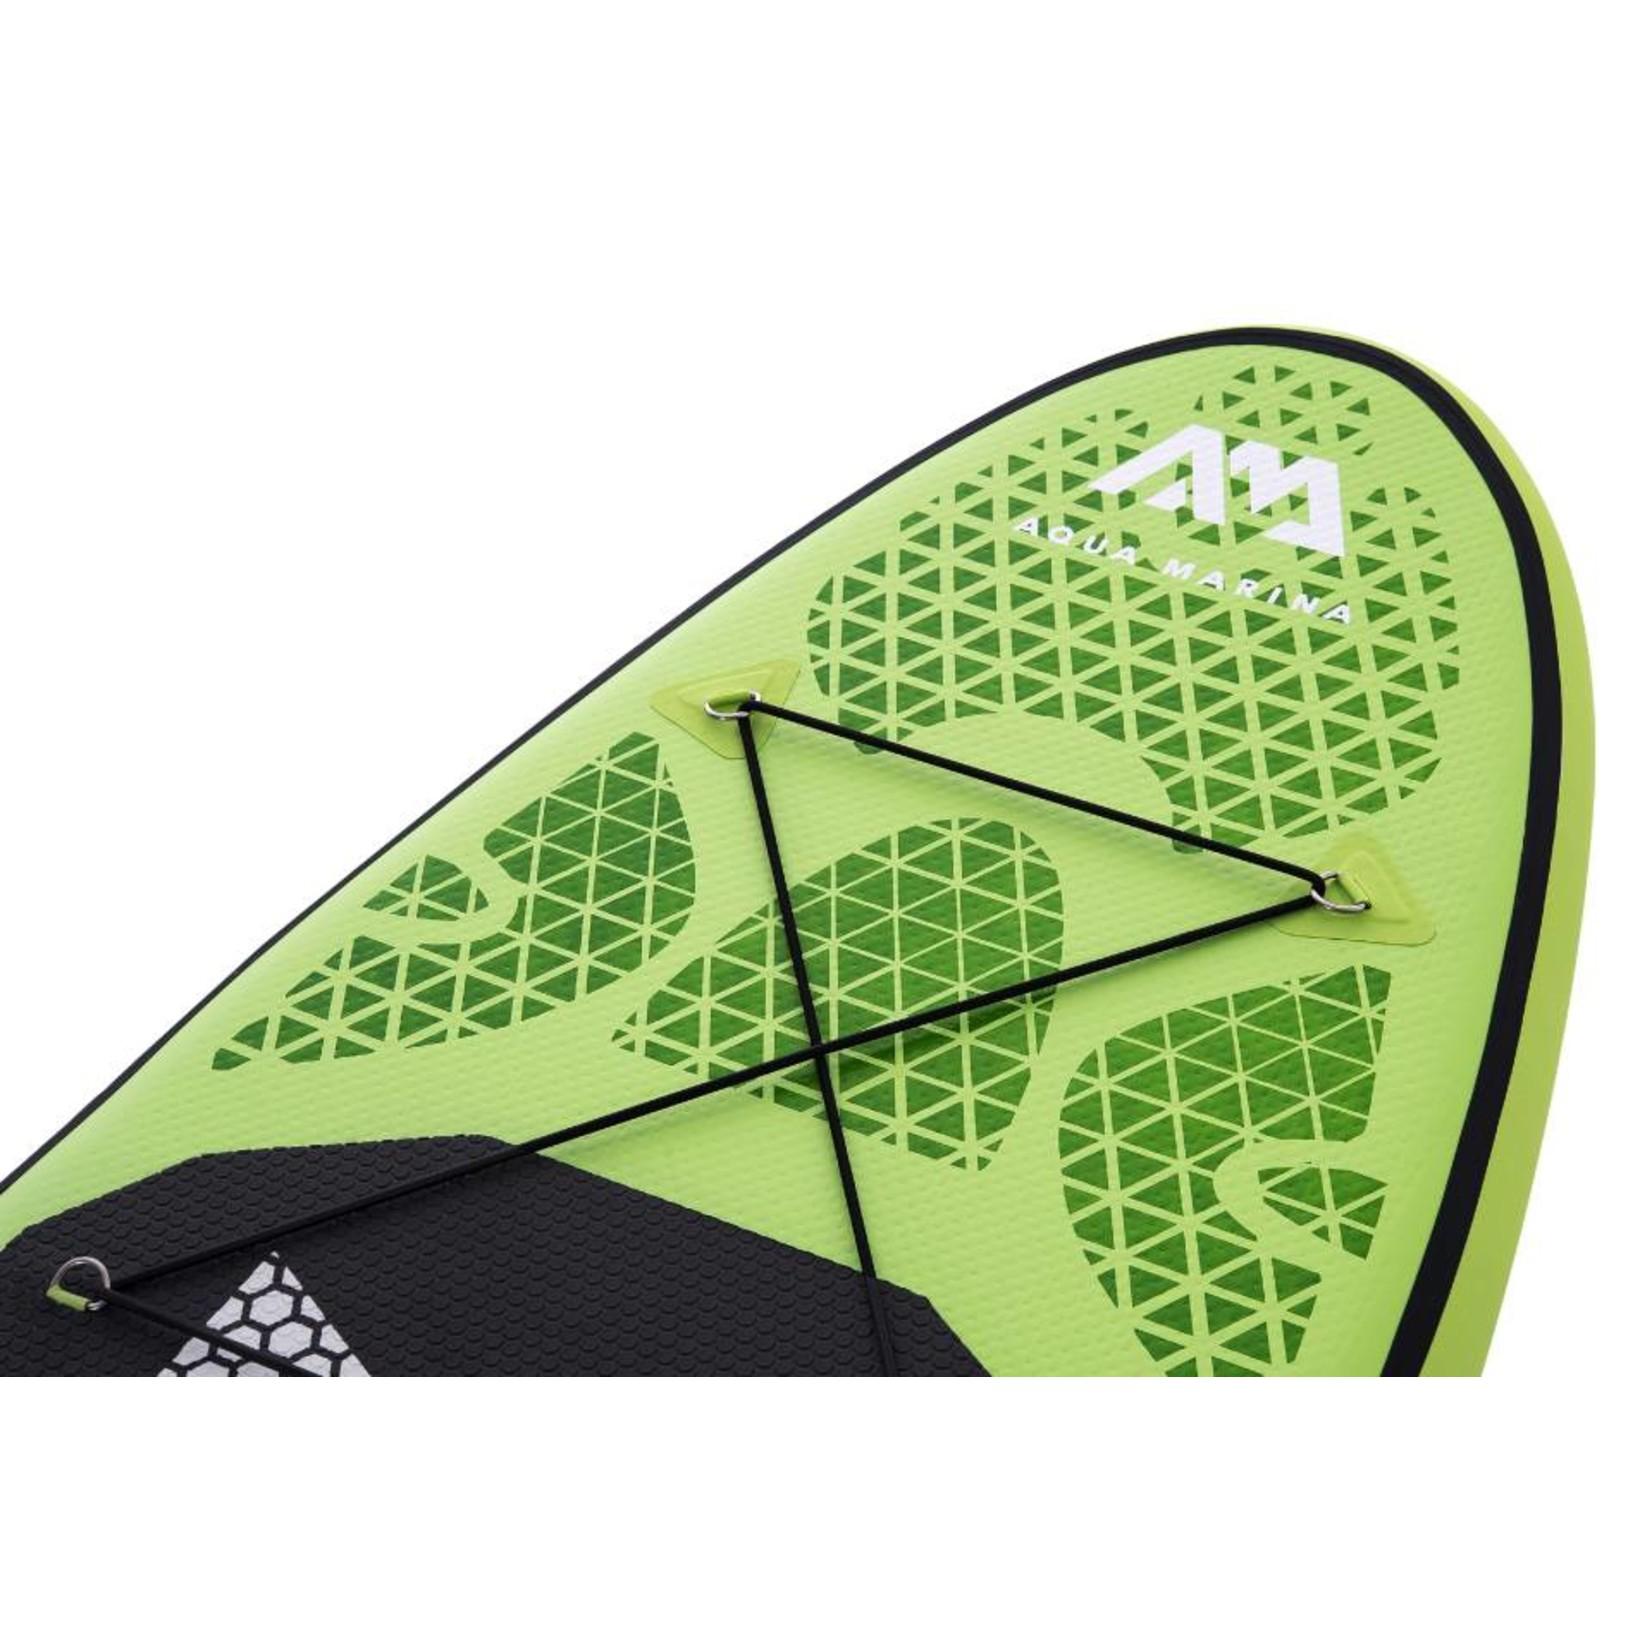 Aqua Marina All Round Breeze - Inflatable Paddle Board